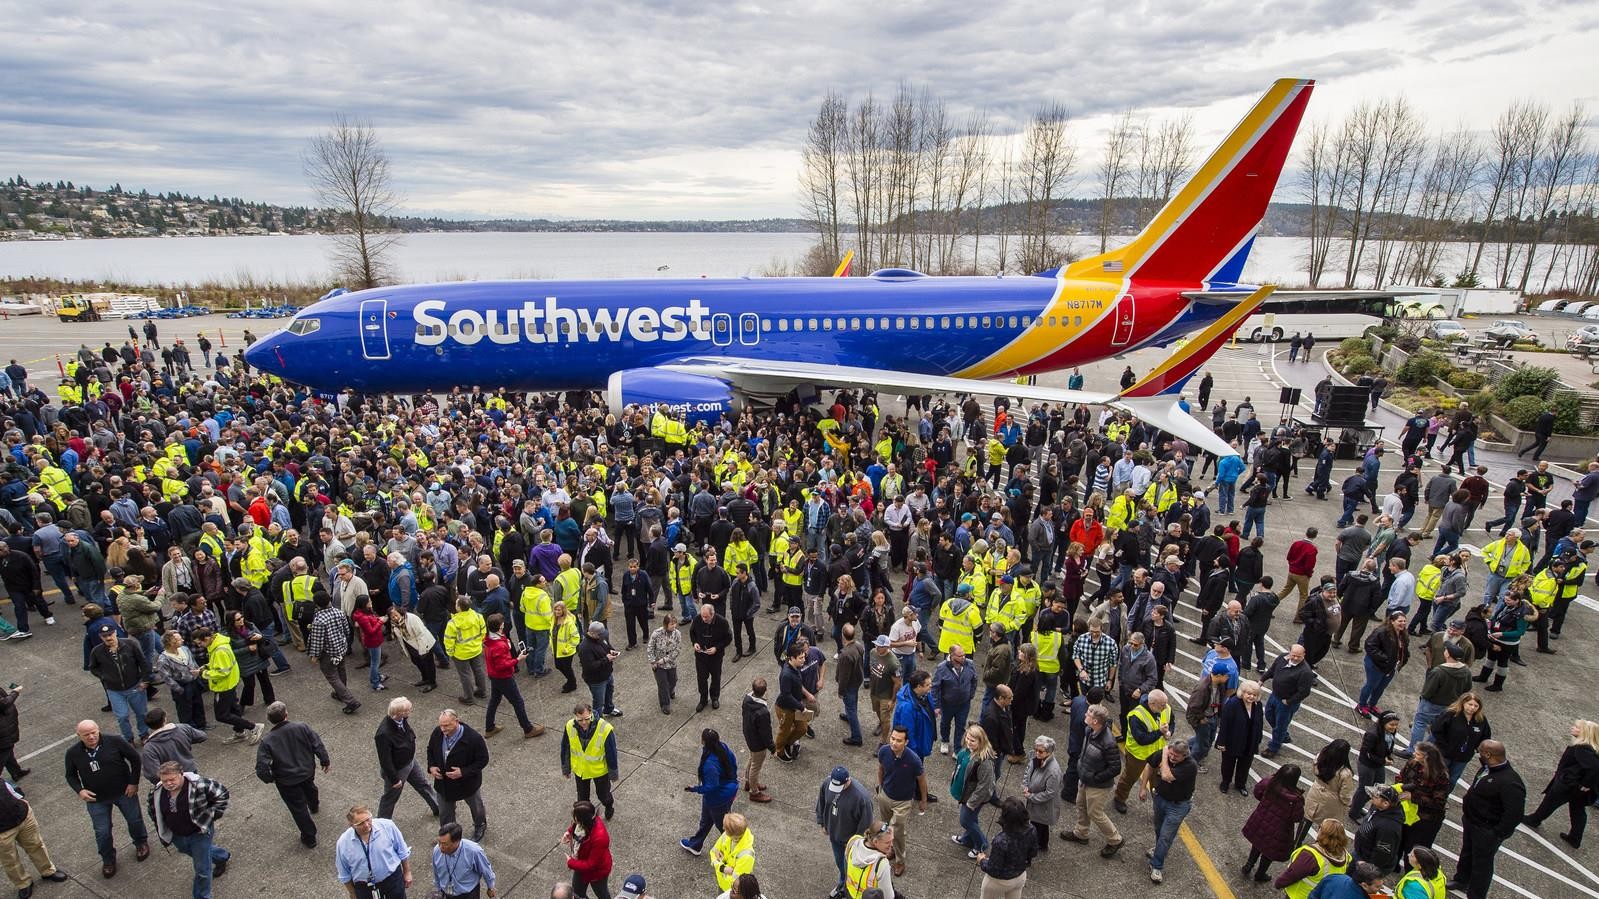 Boeing tiene un nuevo récord Guinness